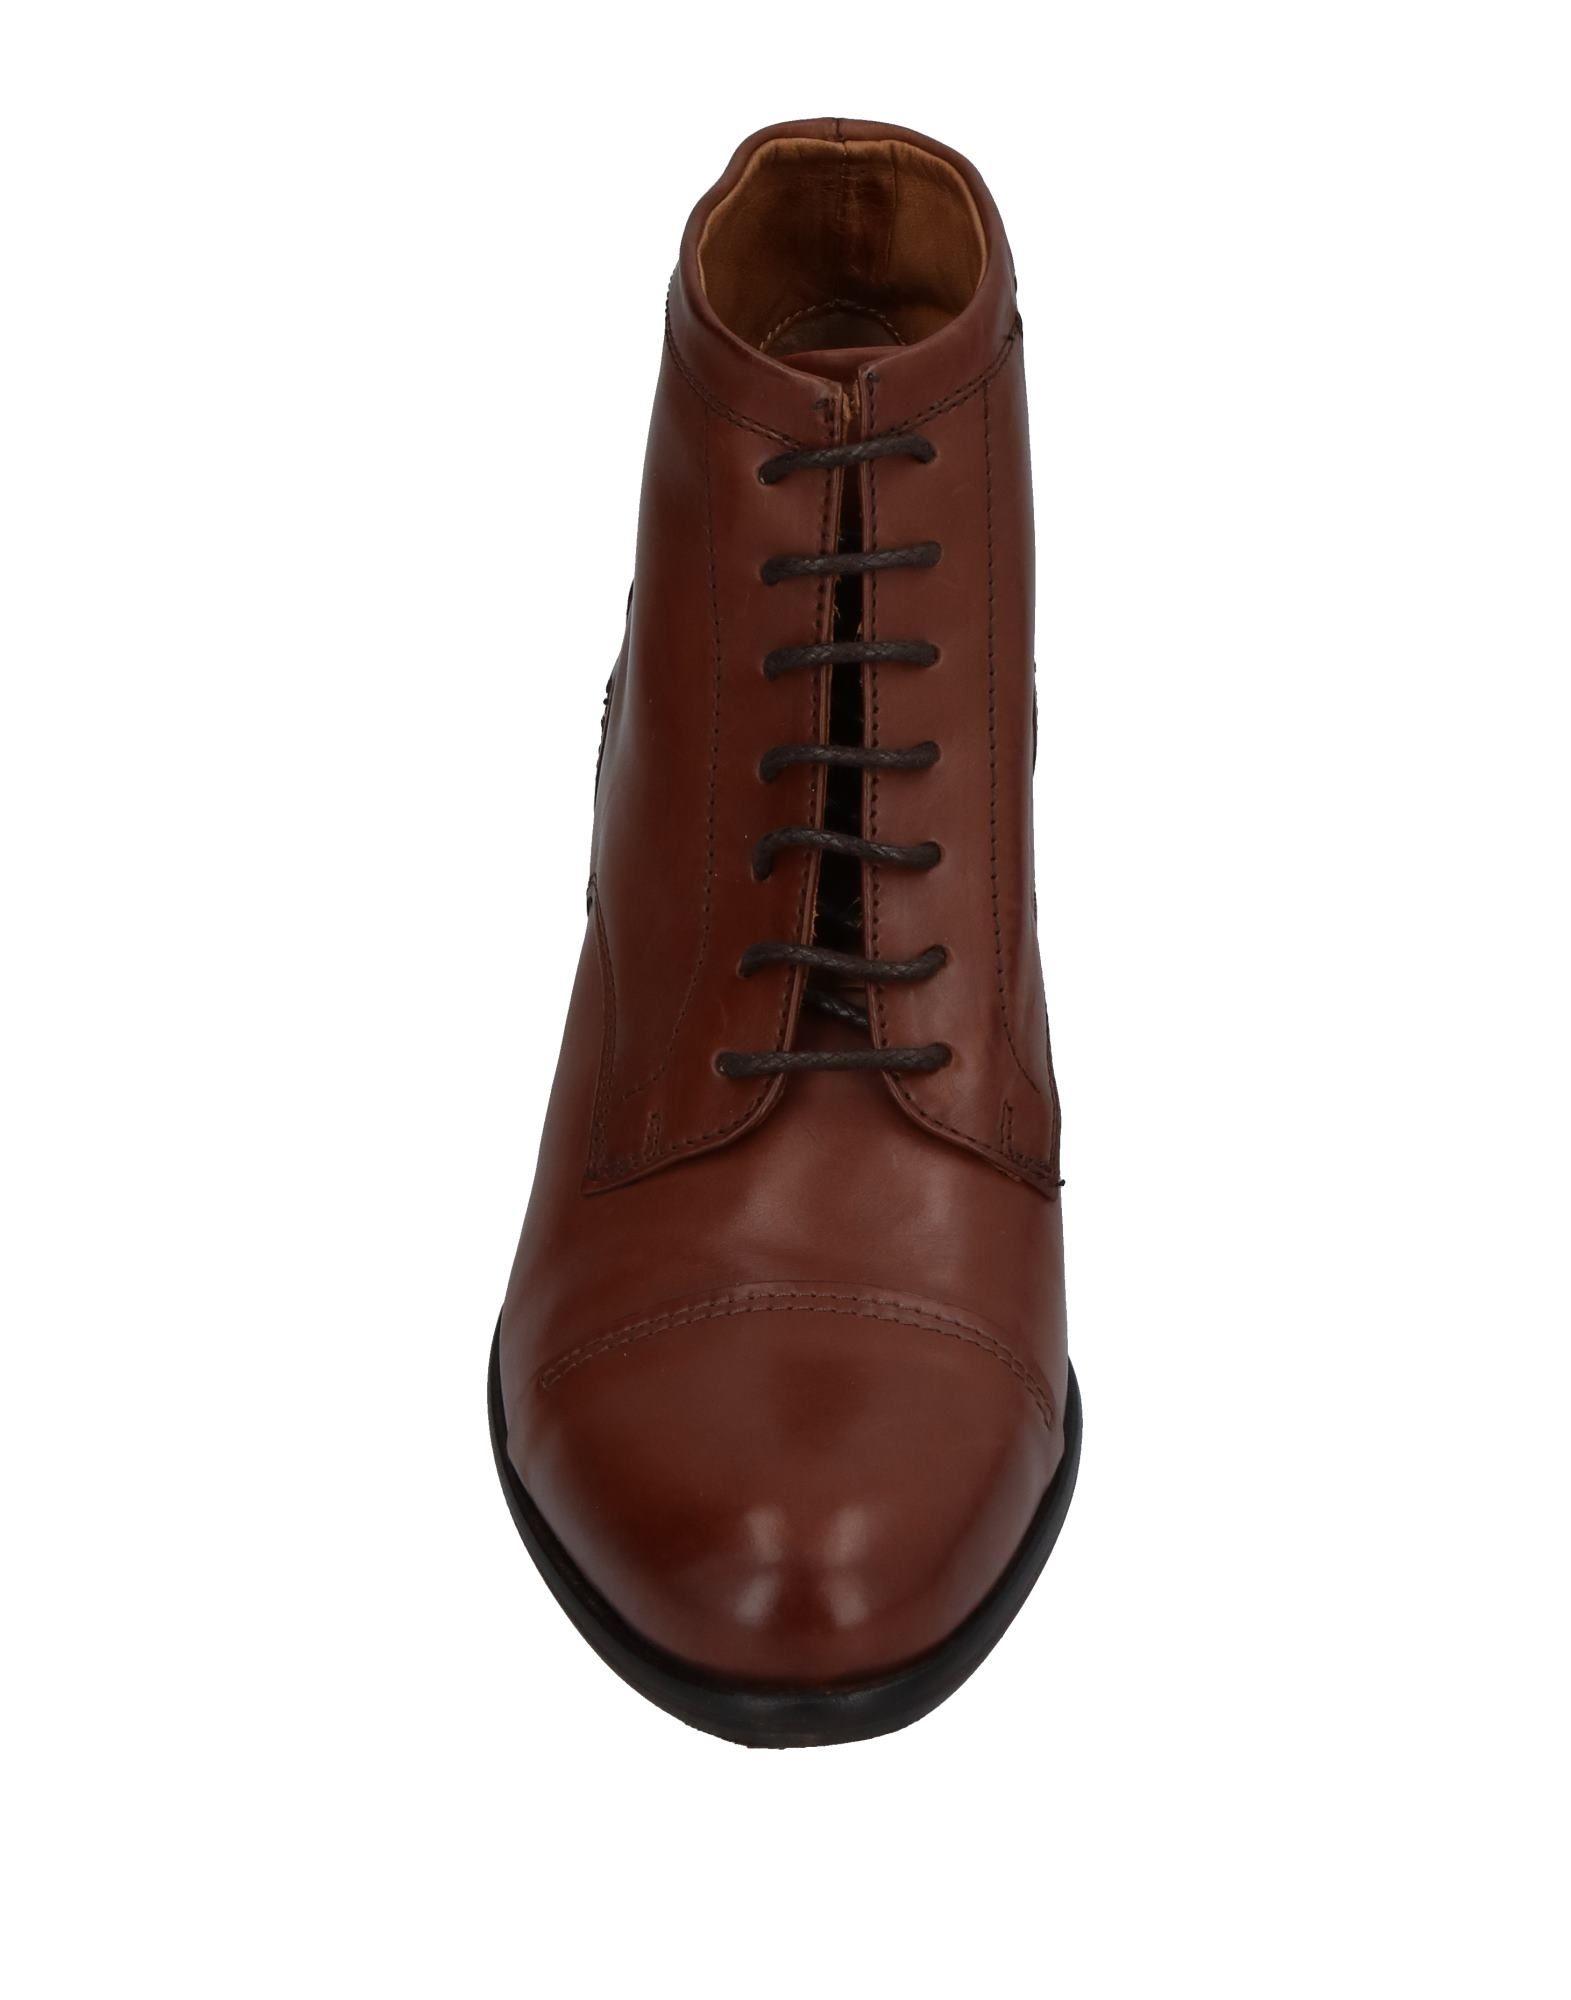 Stilvolle billige billige billige Schuhe Alberto Fermani Schnürschuhe Damen  11380756UL 557238